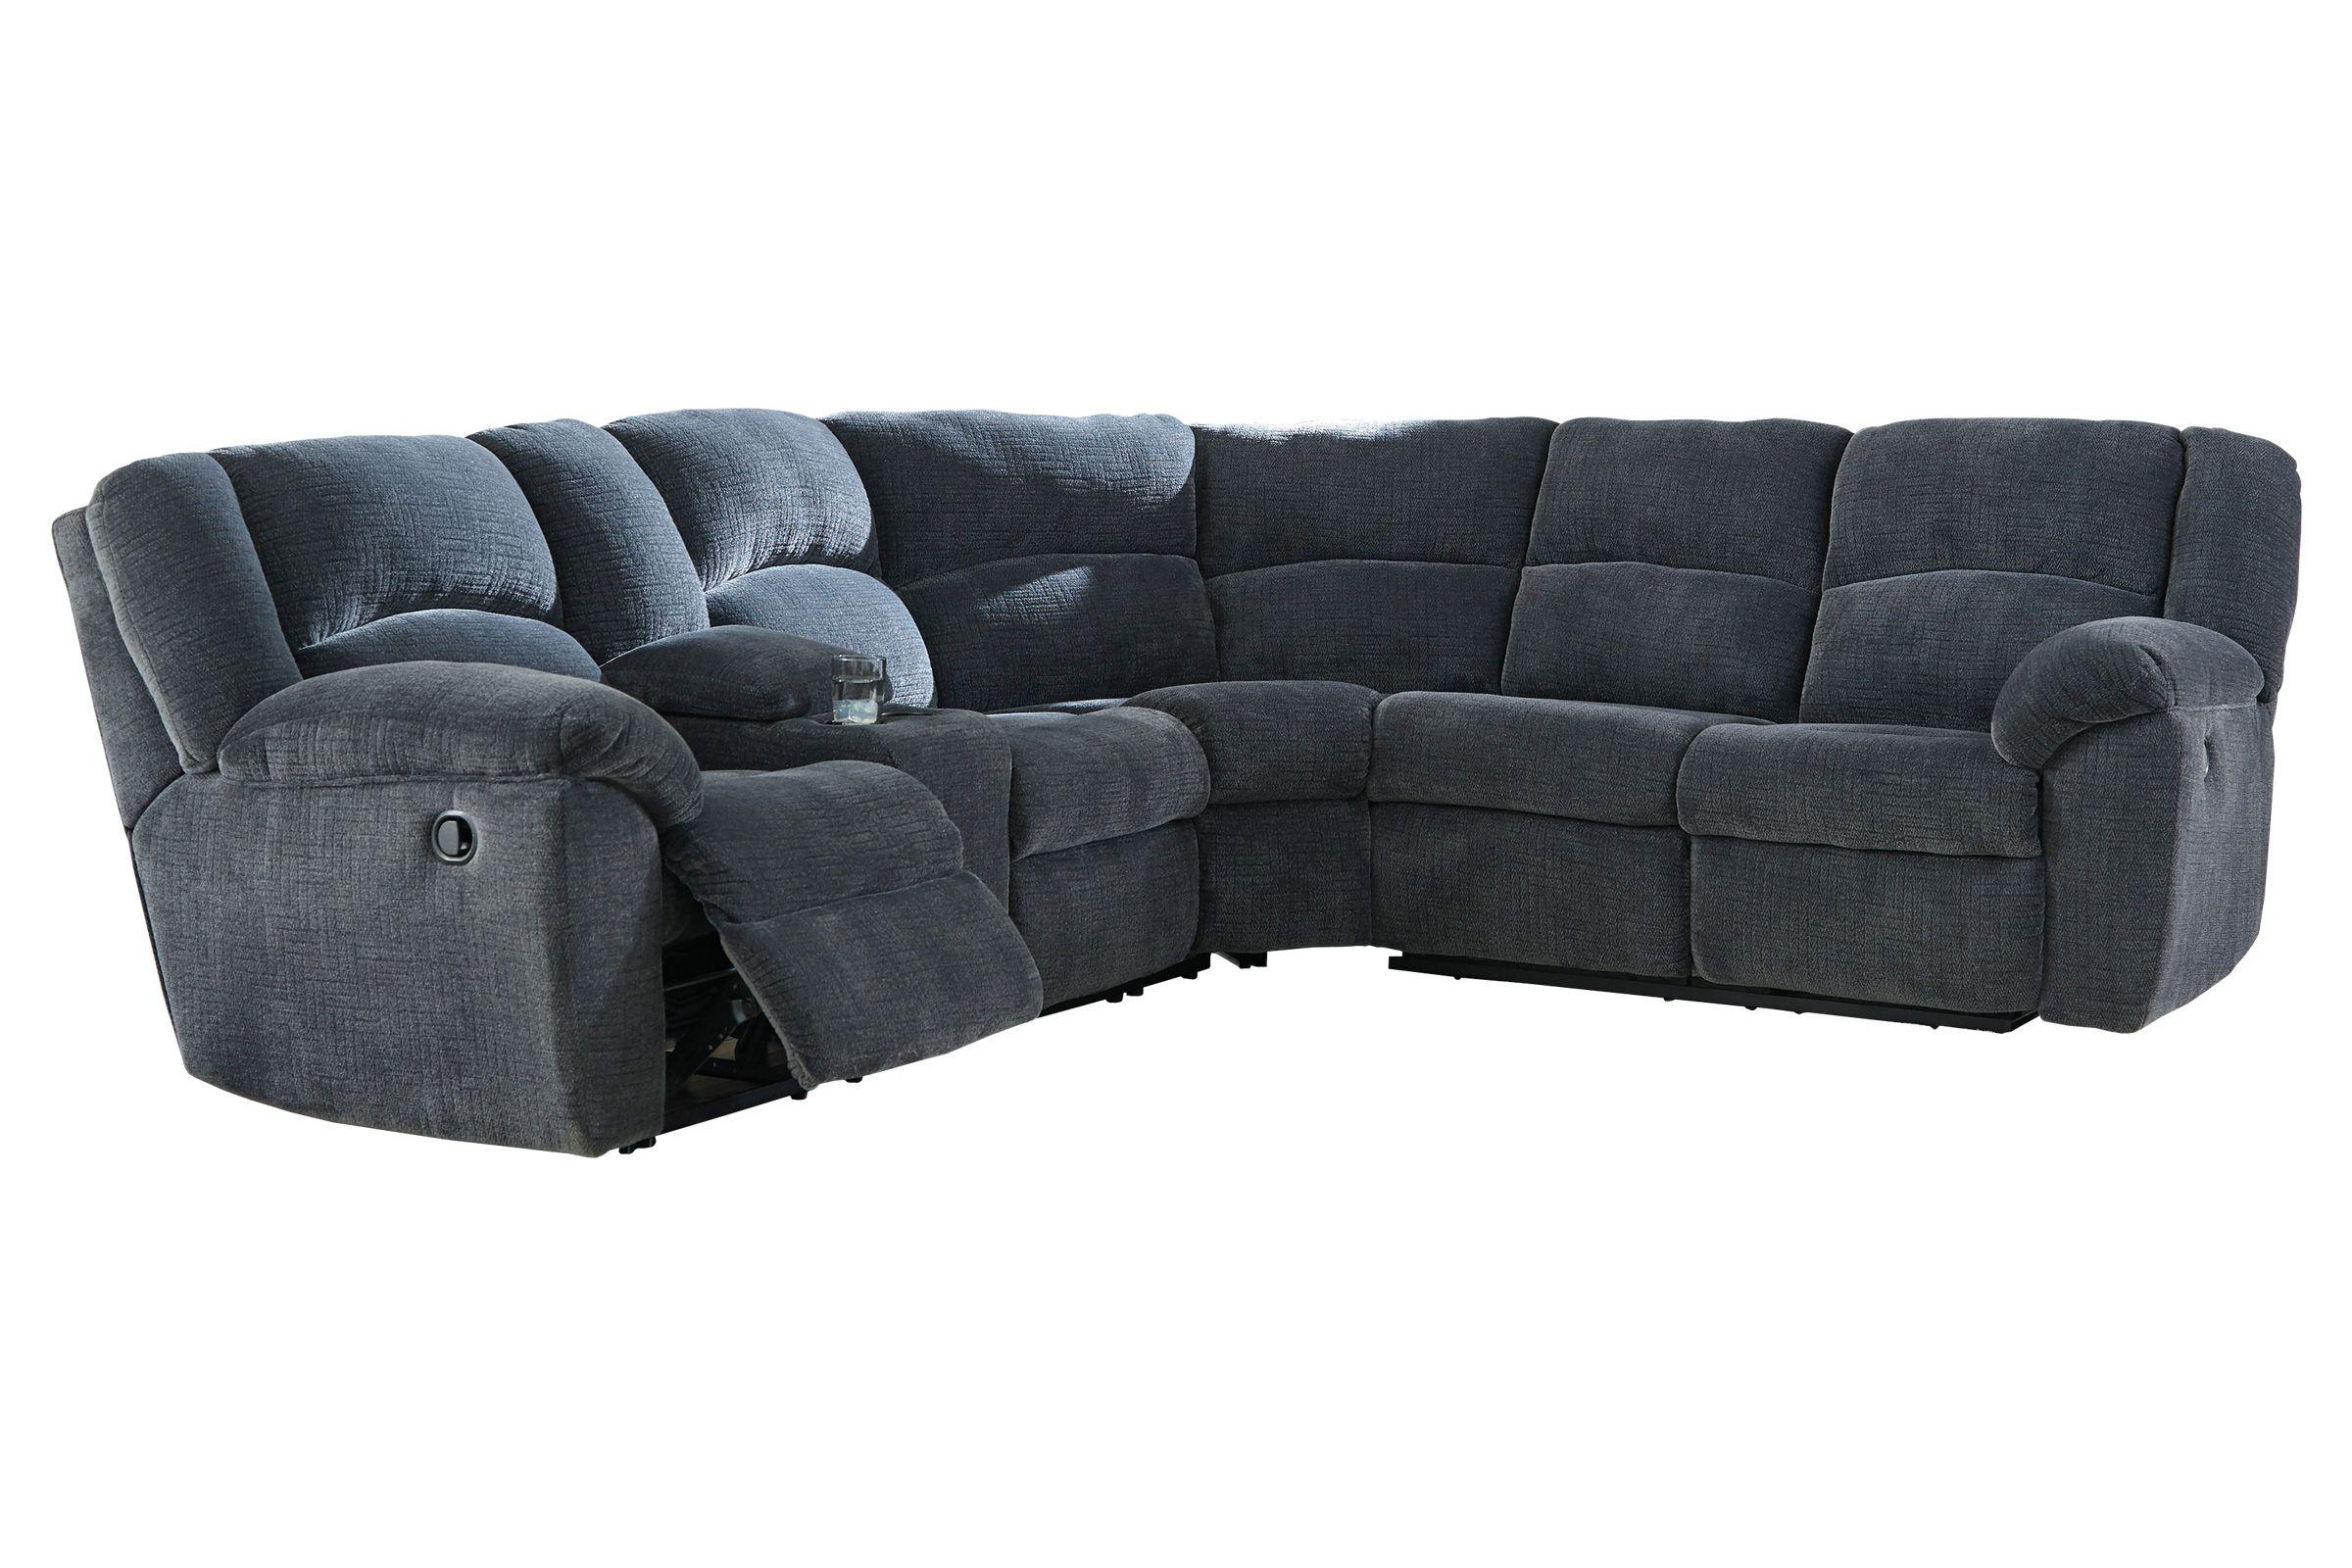 Shop Sectionals at Gardner White Furniture